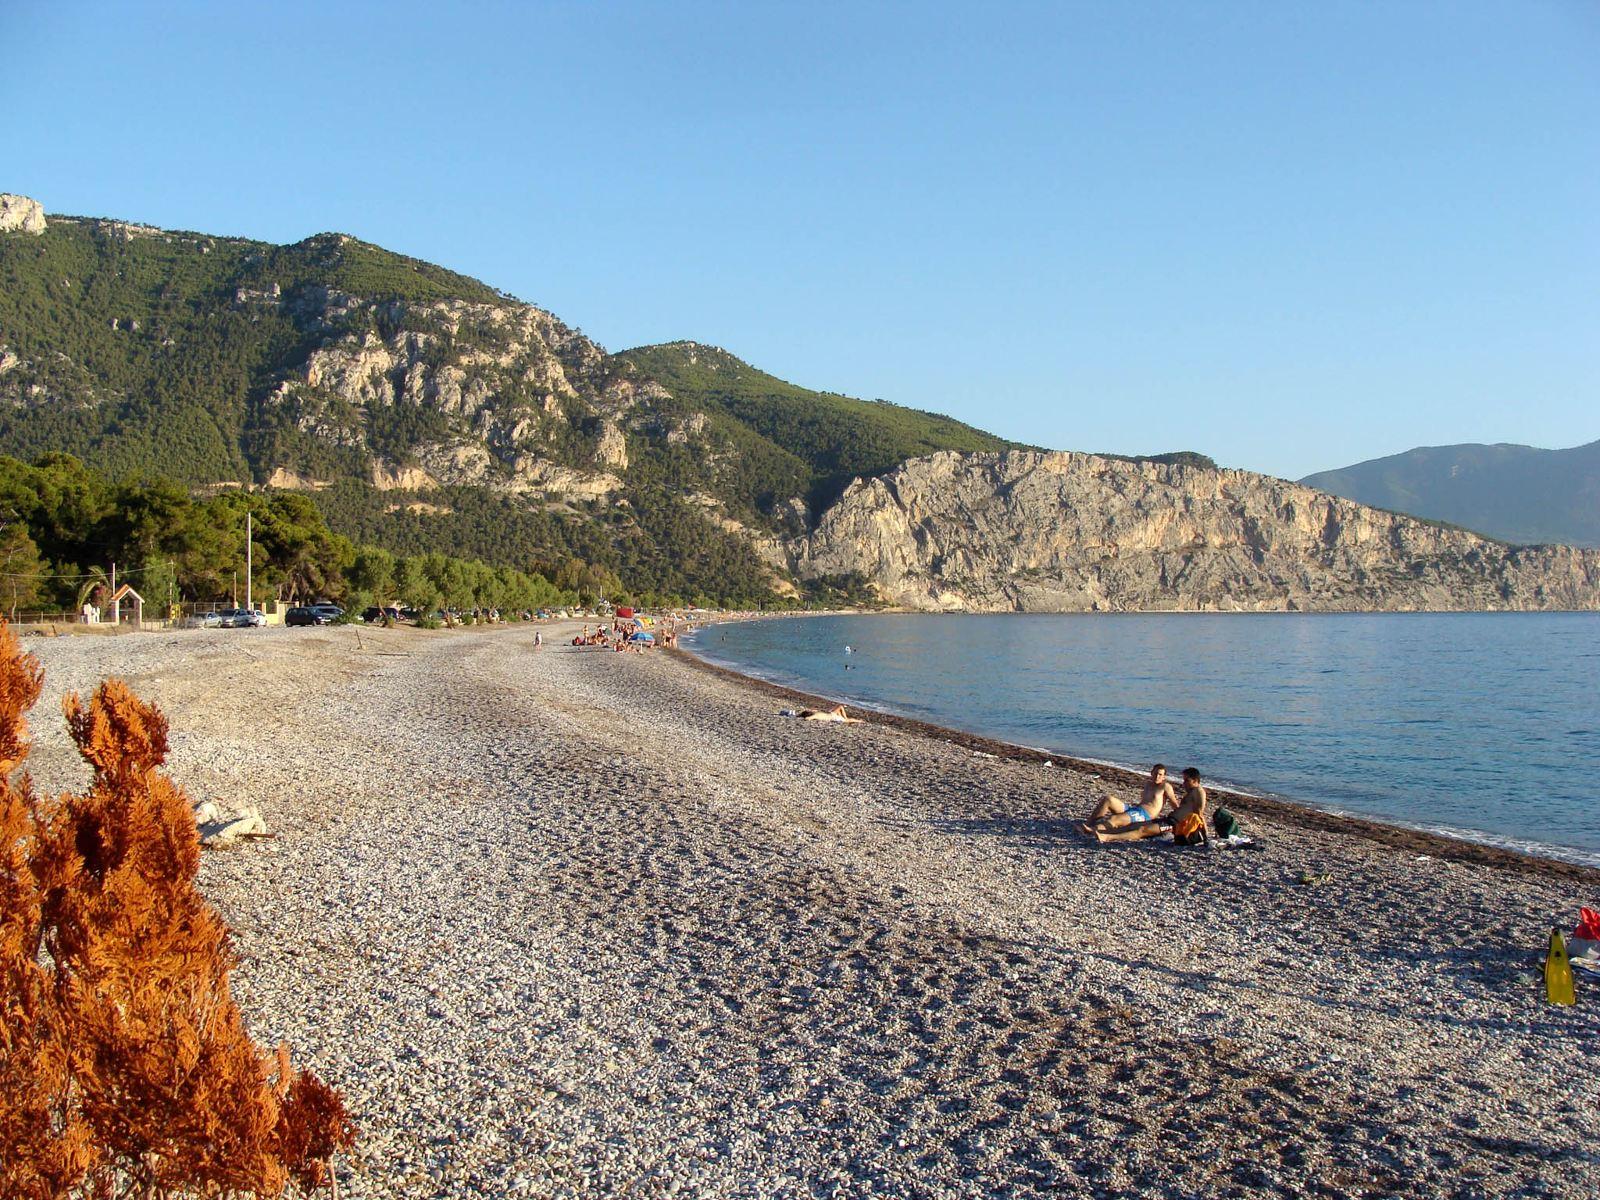 Psatha beach as captured from Kavo Ntoro tavern. Source: greece.com